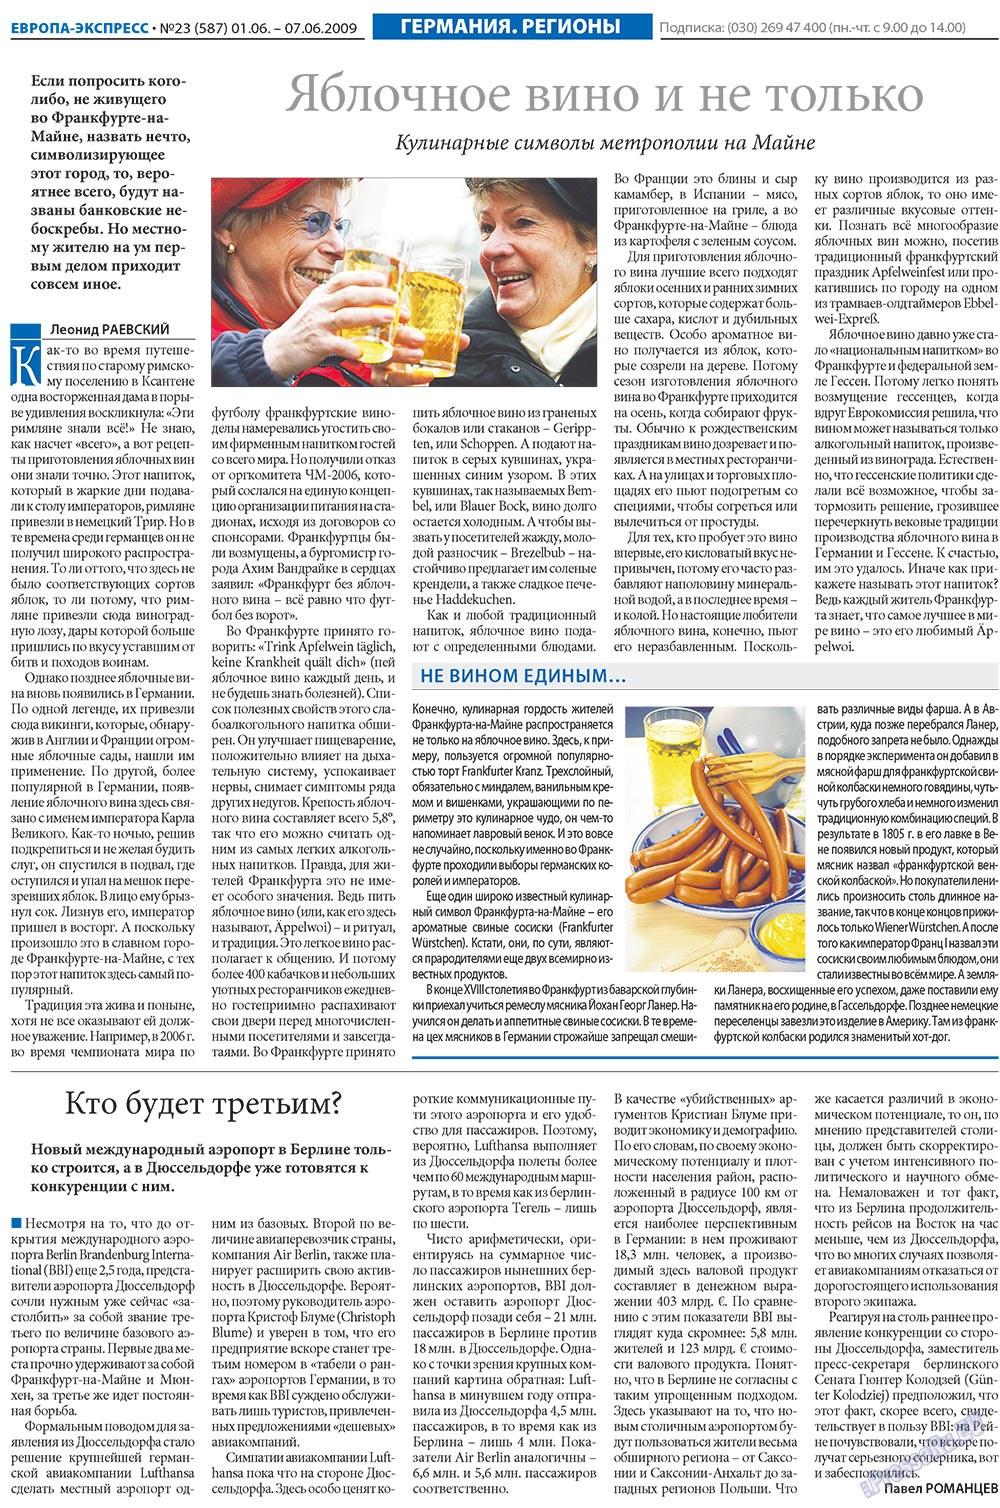 Европа экспресс (газета). 2009 год, номер 23, стр. 7